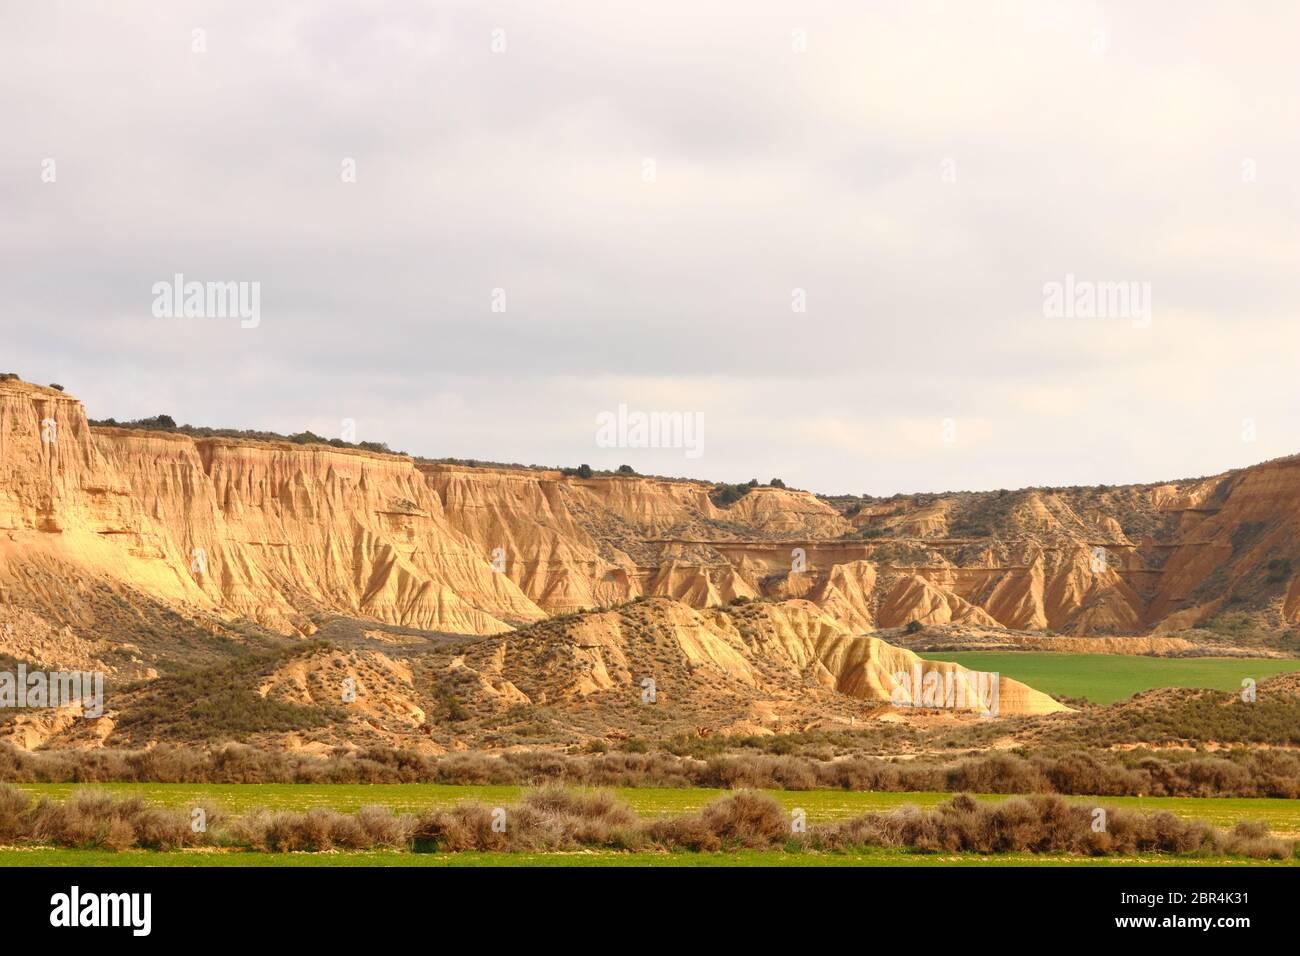 Striking landforms and erosional features in the semi-desert natural region Bardenas Reales, UNESCO Biosphere Reserve, Navarra, Spain Stock Photo